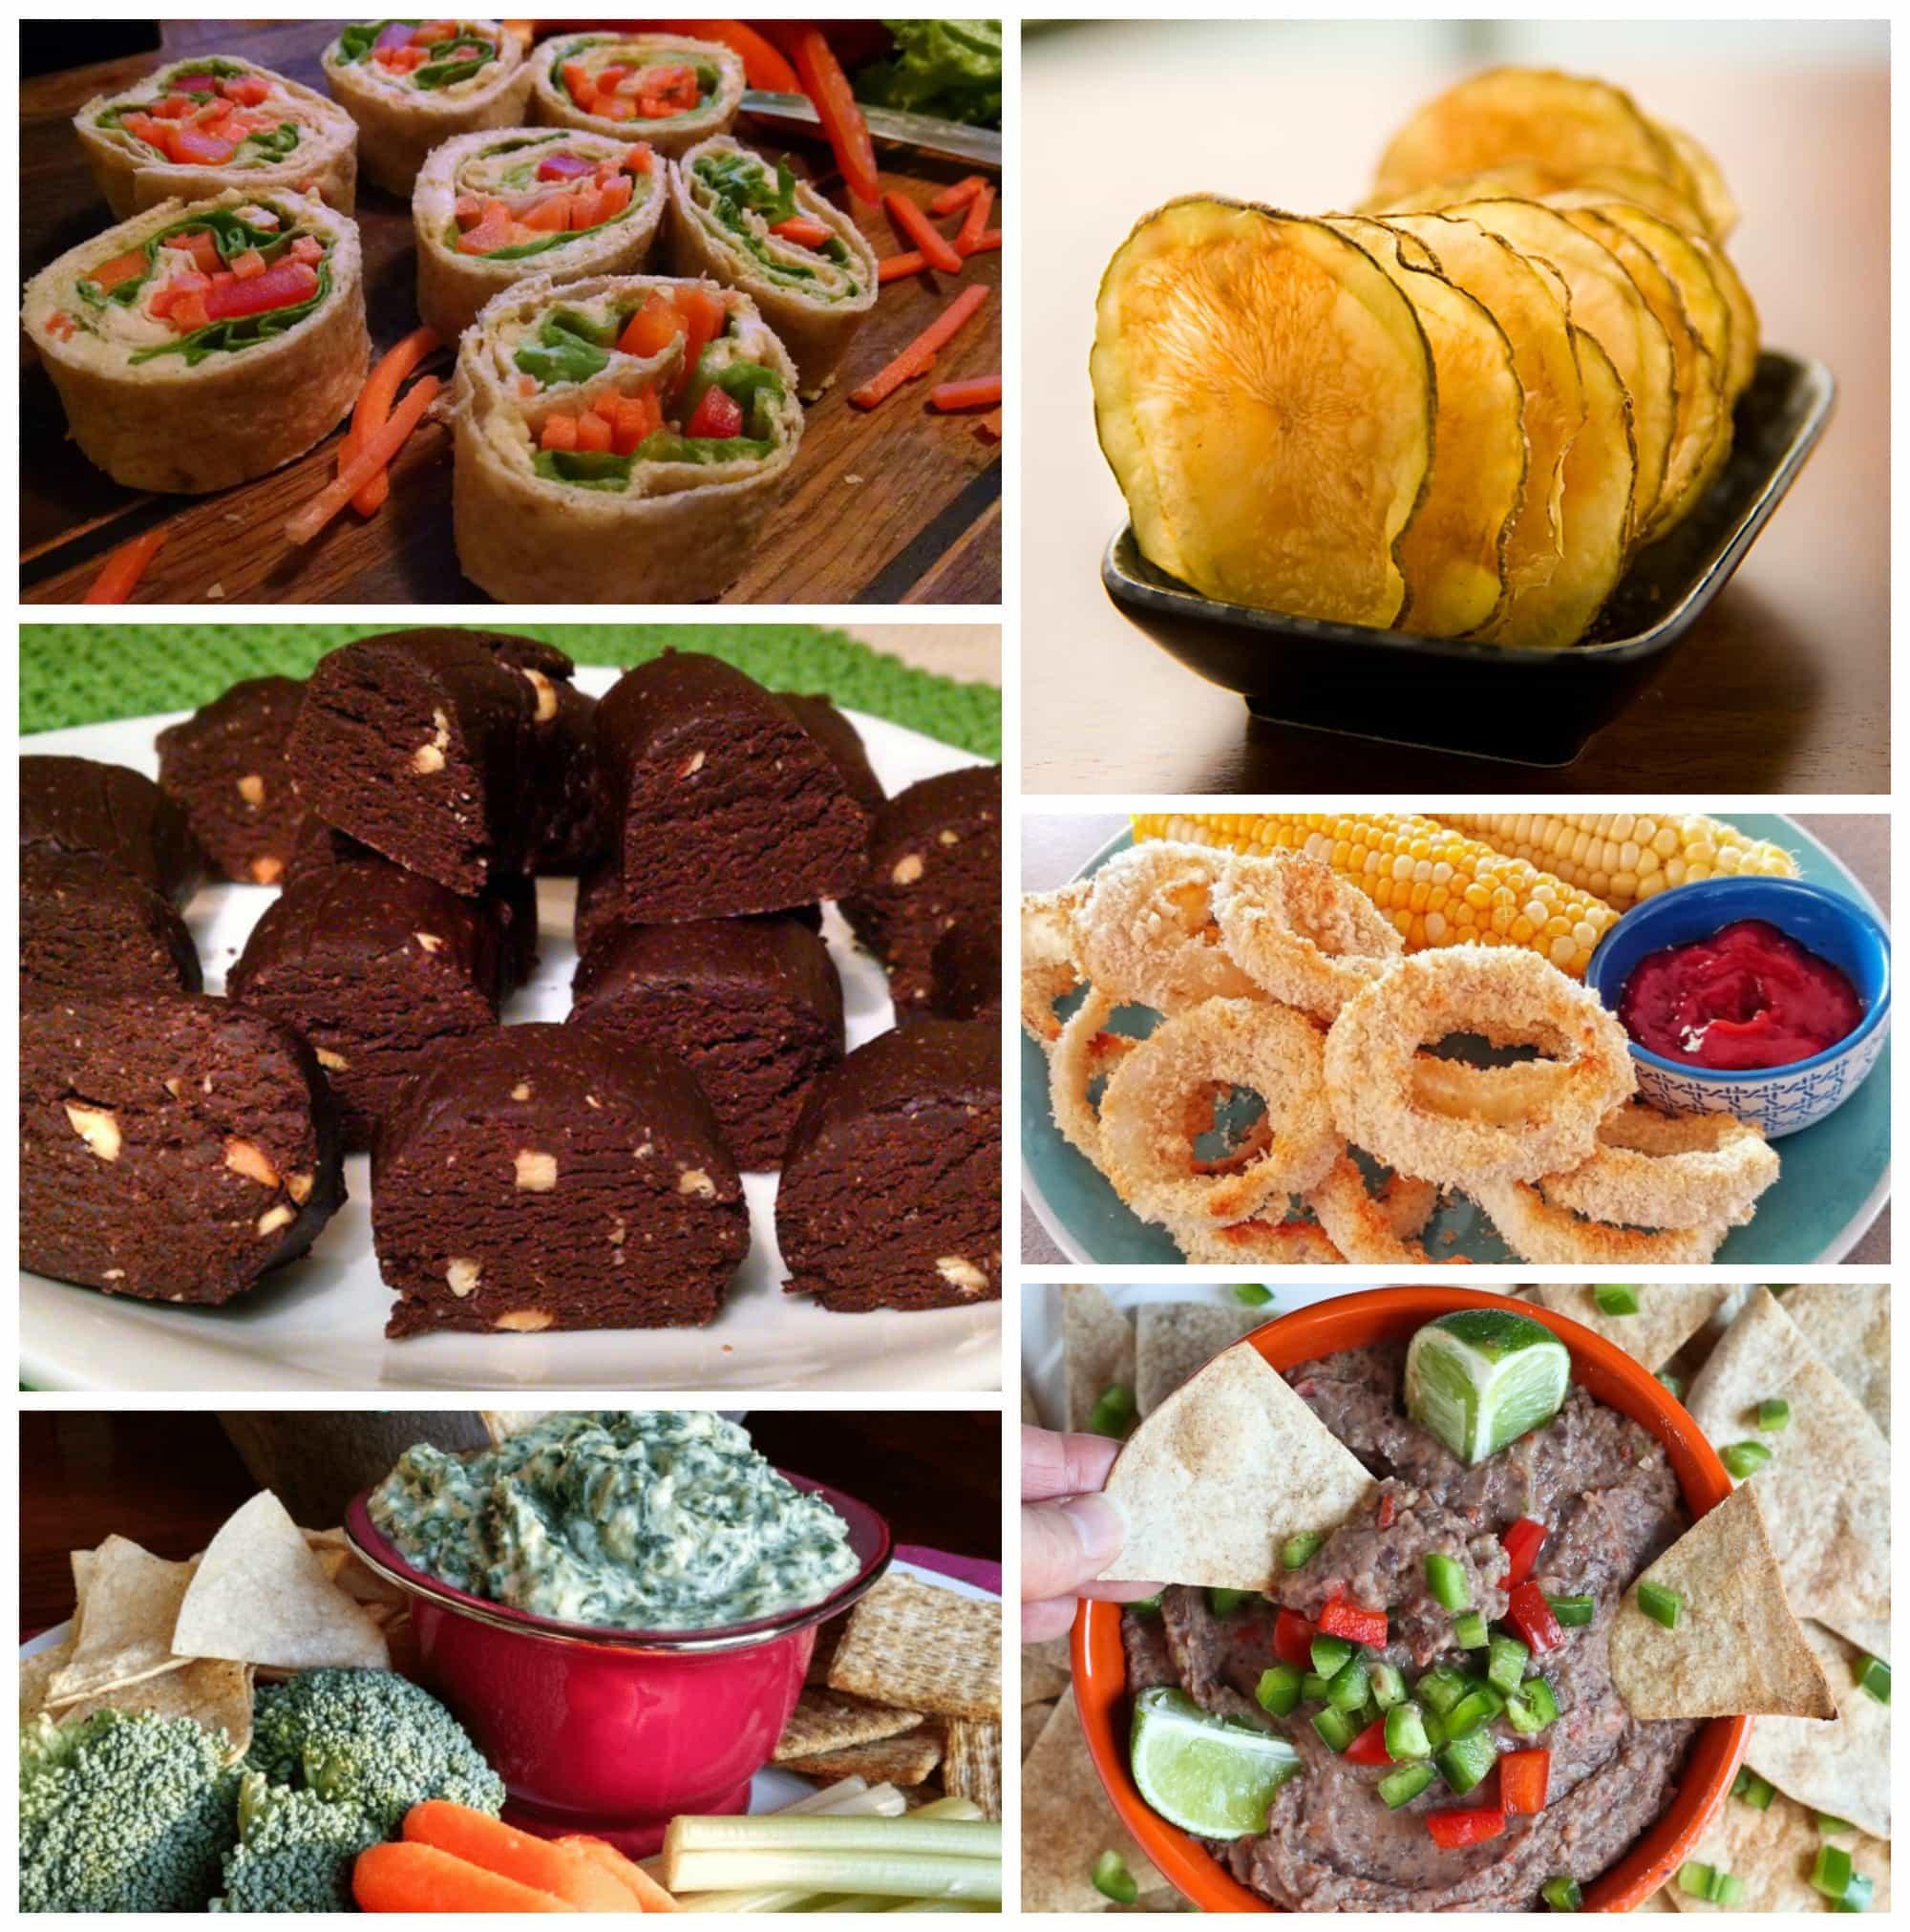 Healthy Vegetarian Snacks  17 Healthy Vegan Party Snack Ideas